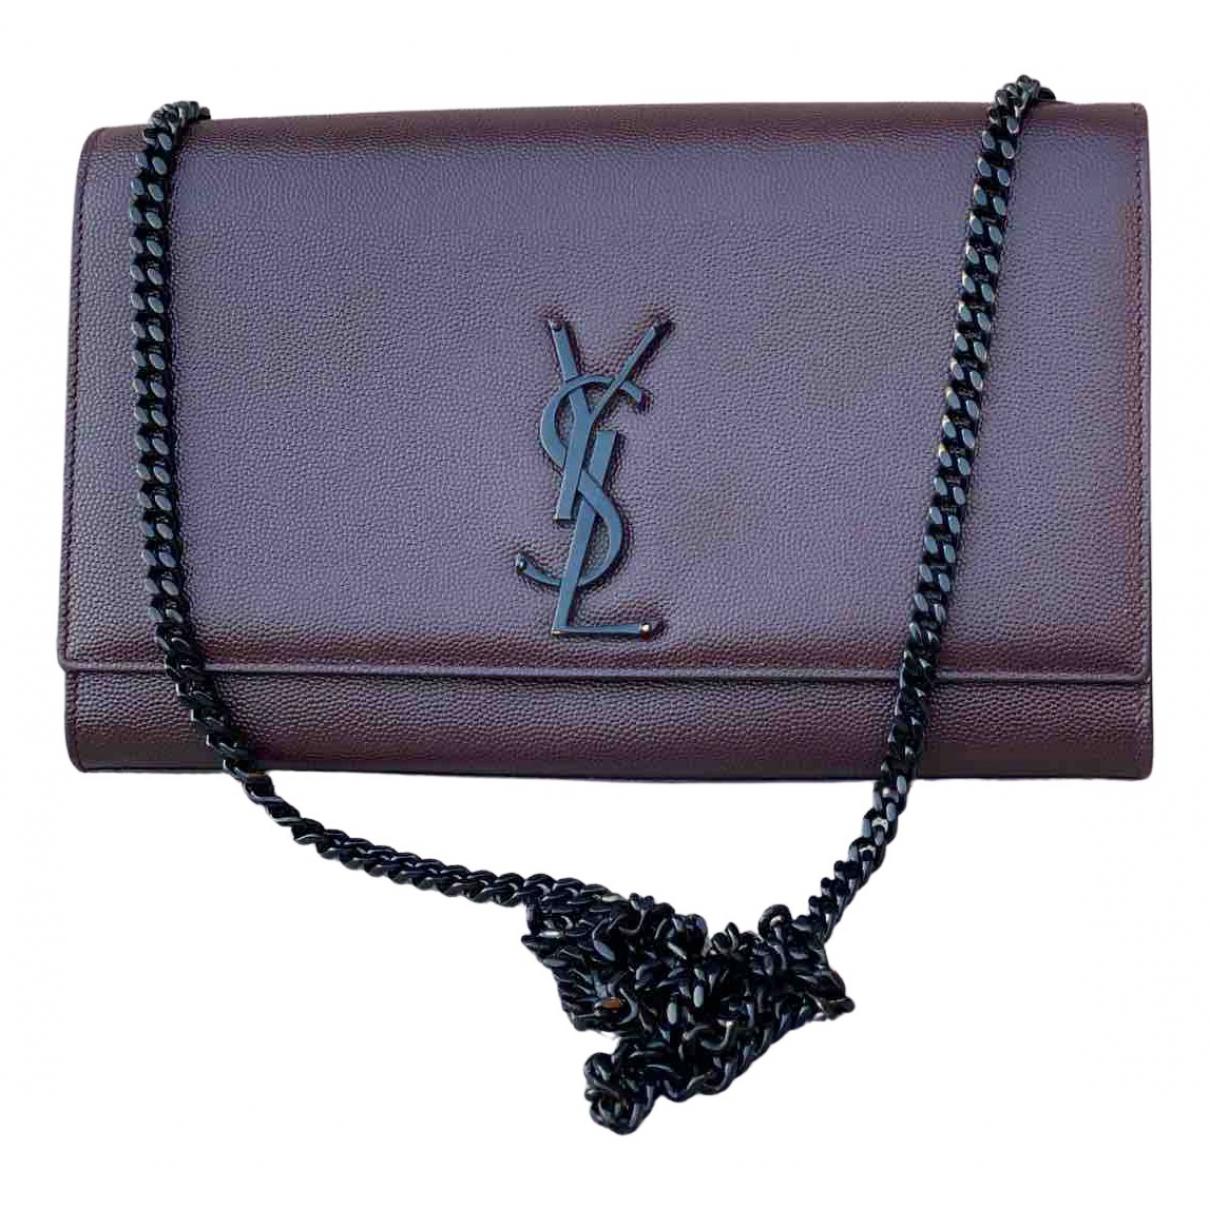 Saint Laurent Kate monogramme Brown Leather handbag for Women N